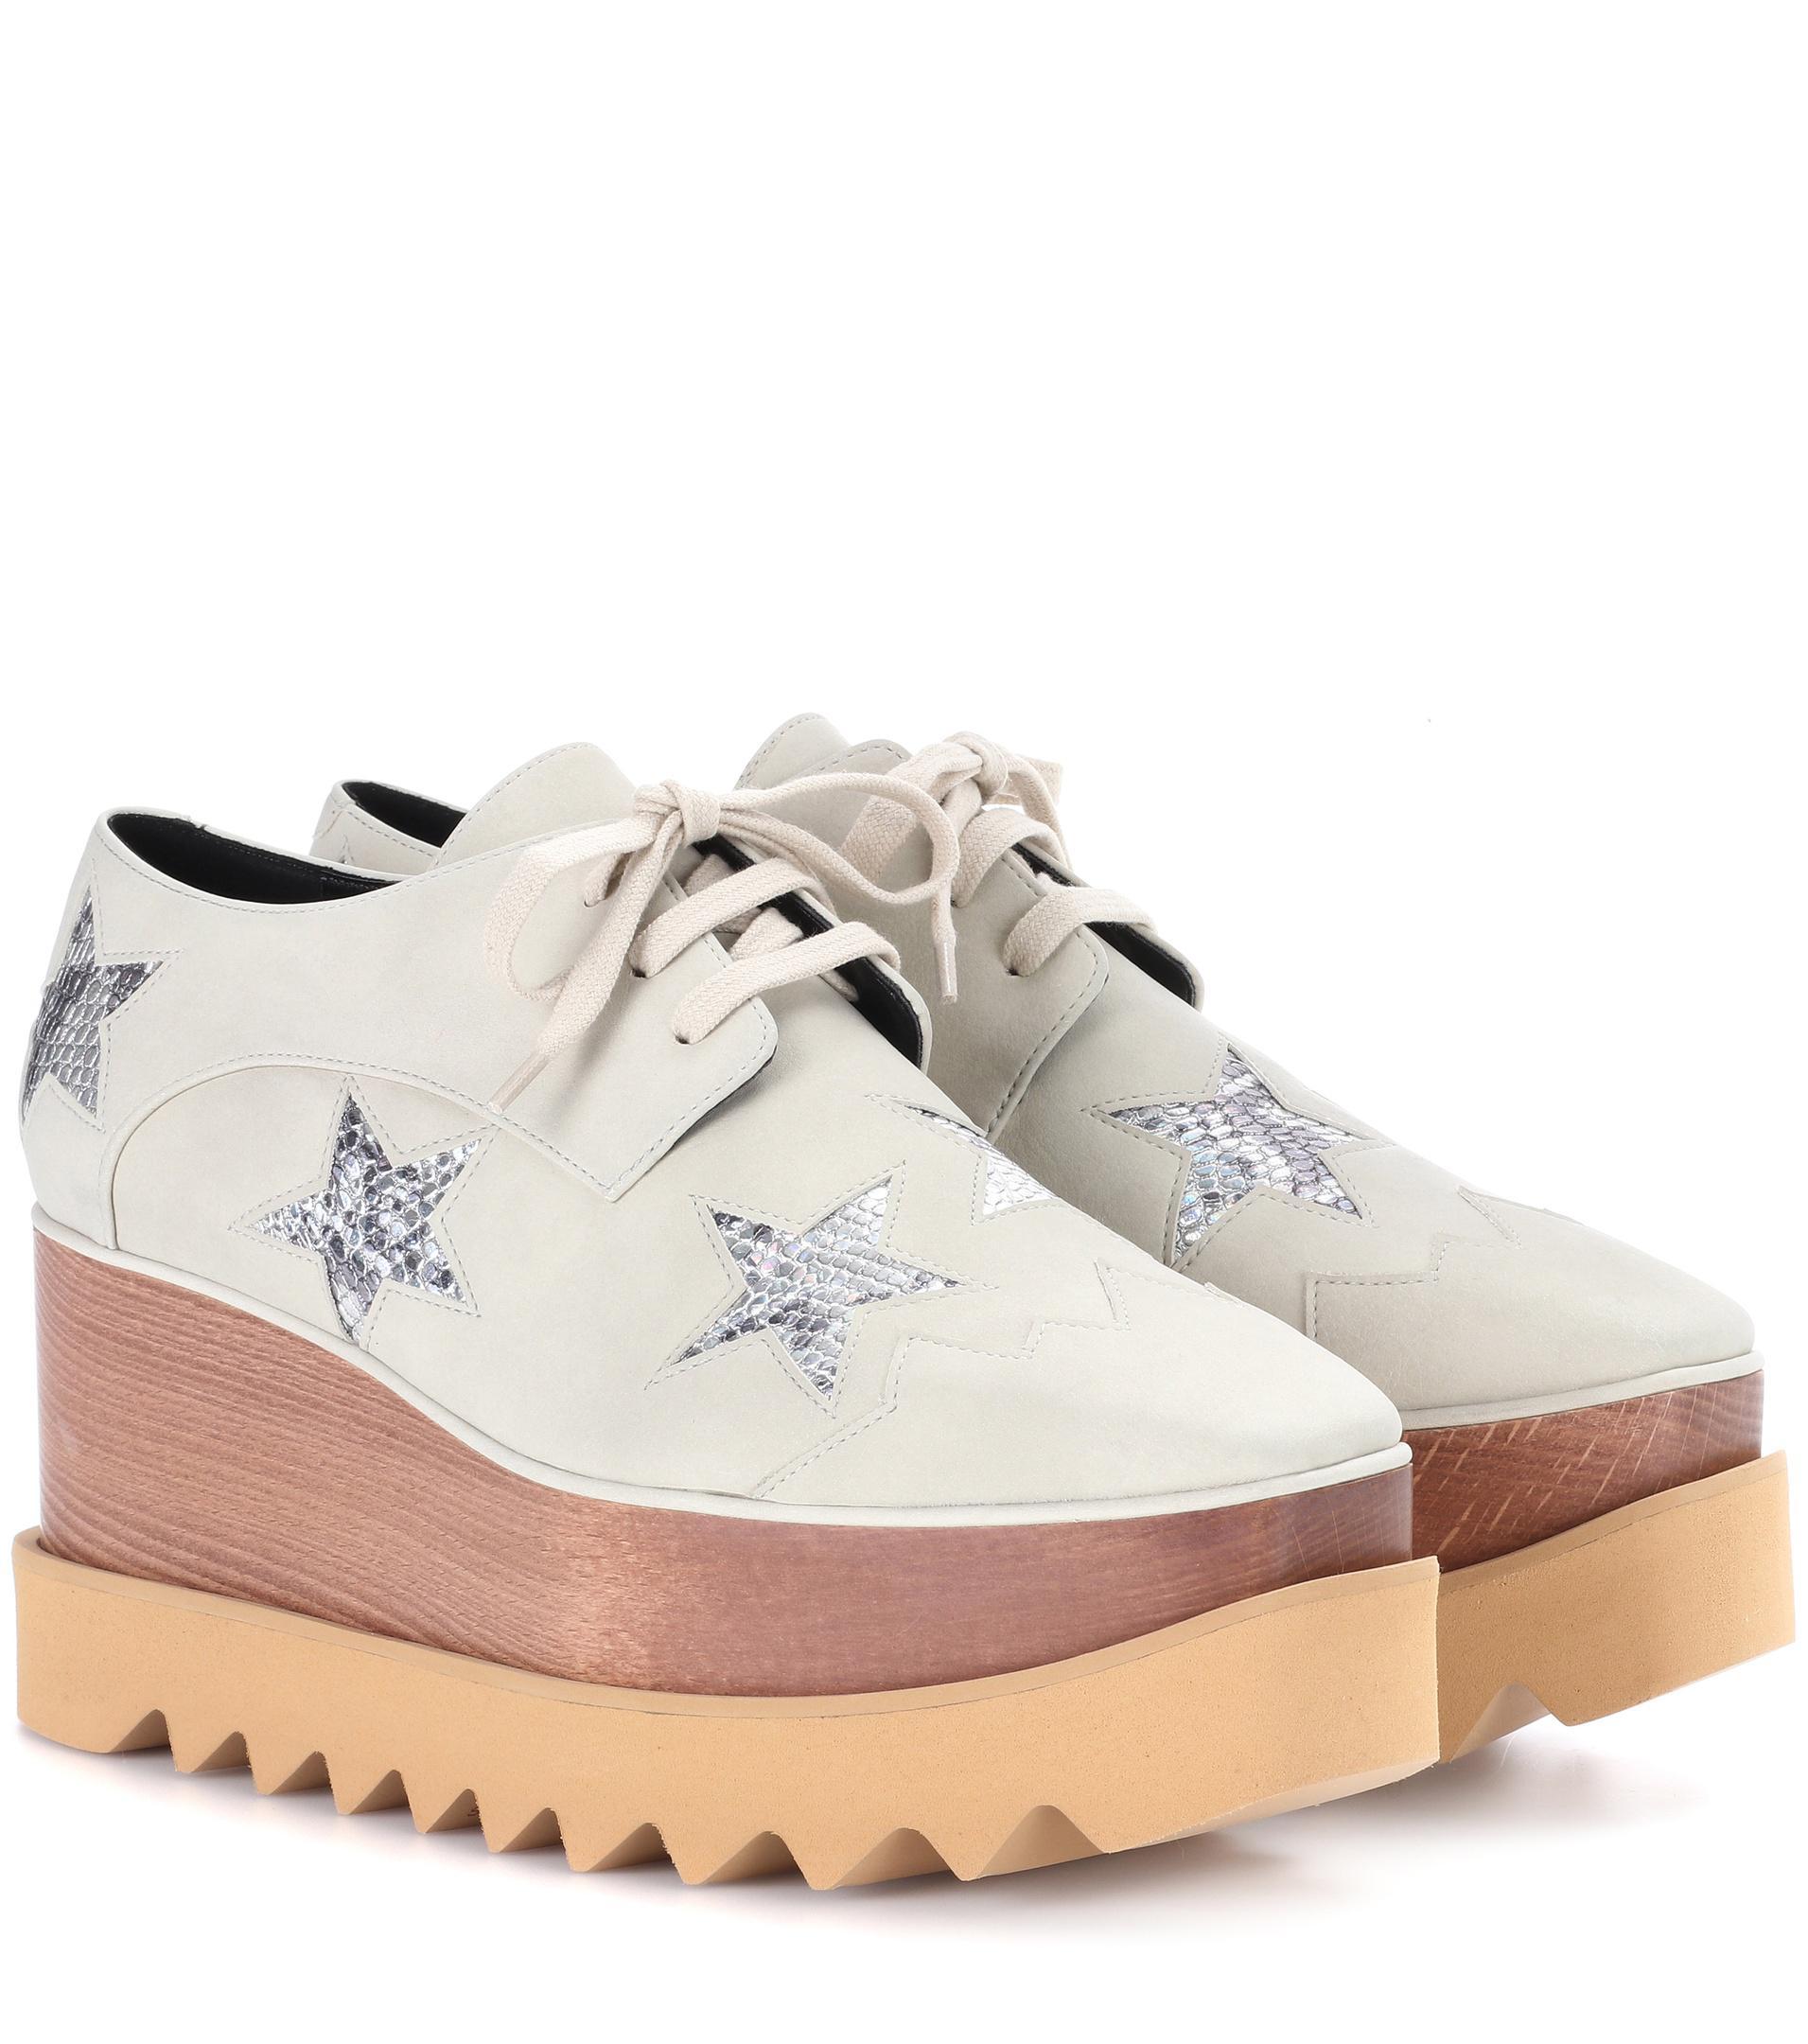 4c18f976ee51 Lyst - Stella McCartney Elyse Star Platform Derby Shoes in Natural